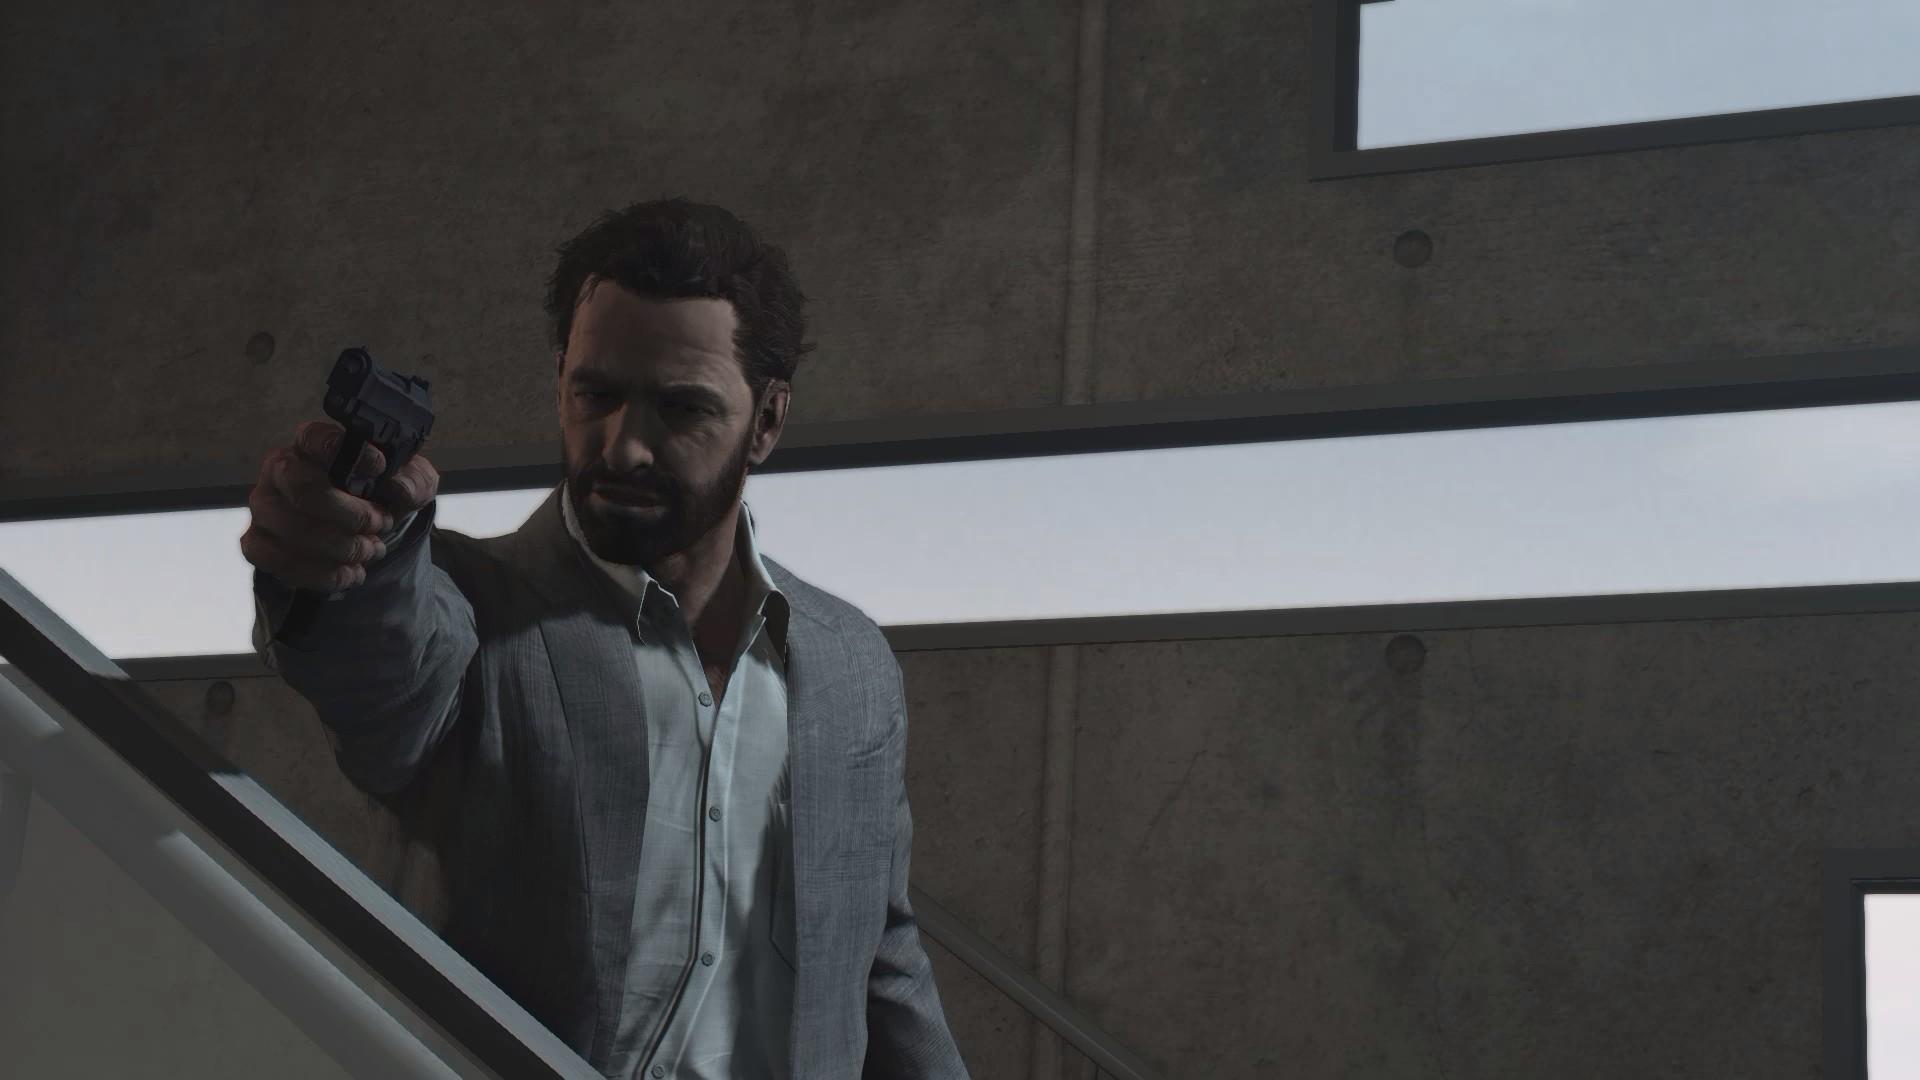 Max Payne Horror Moments in Non-Horror Games 8Bit/Digi